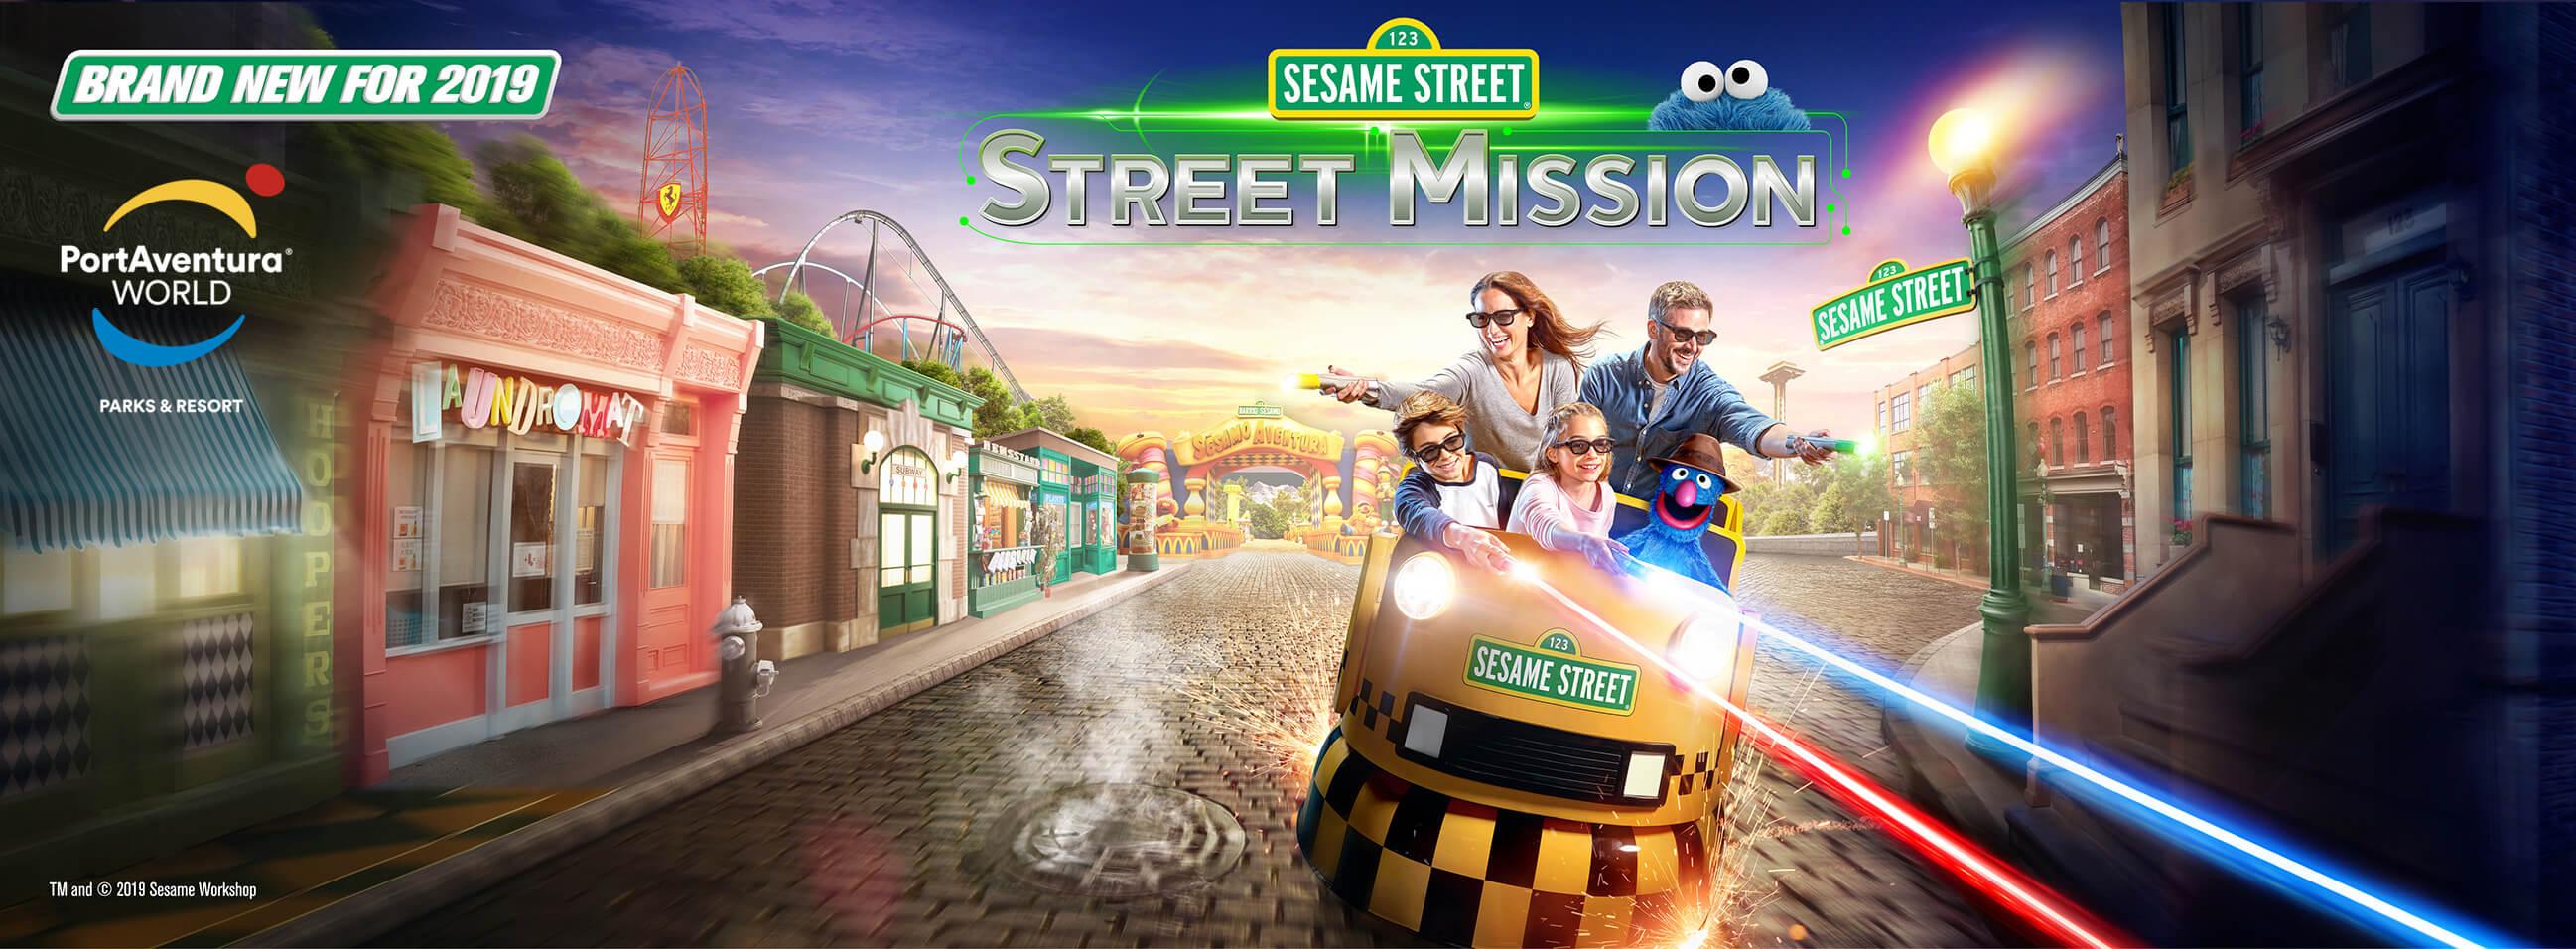 PortAventure Sesame Street